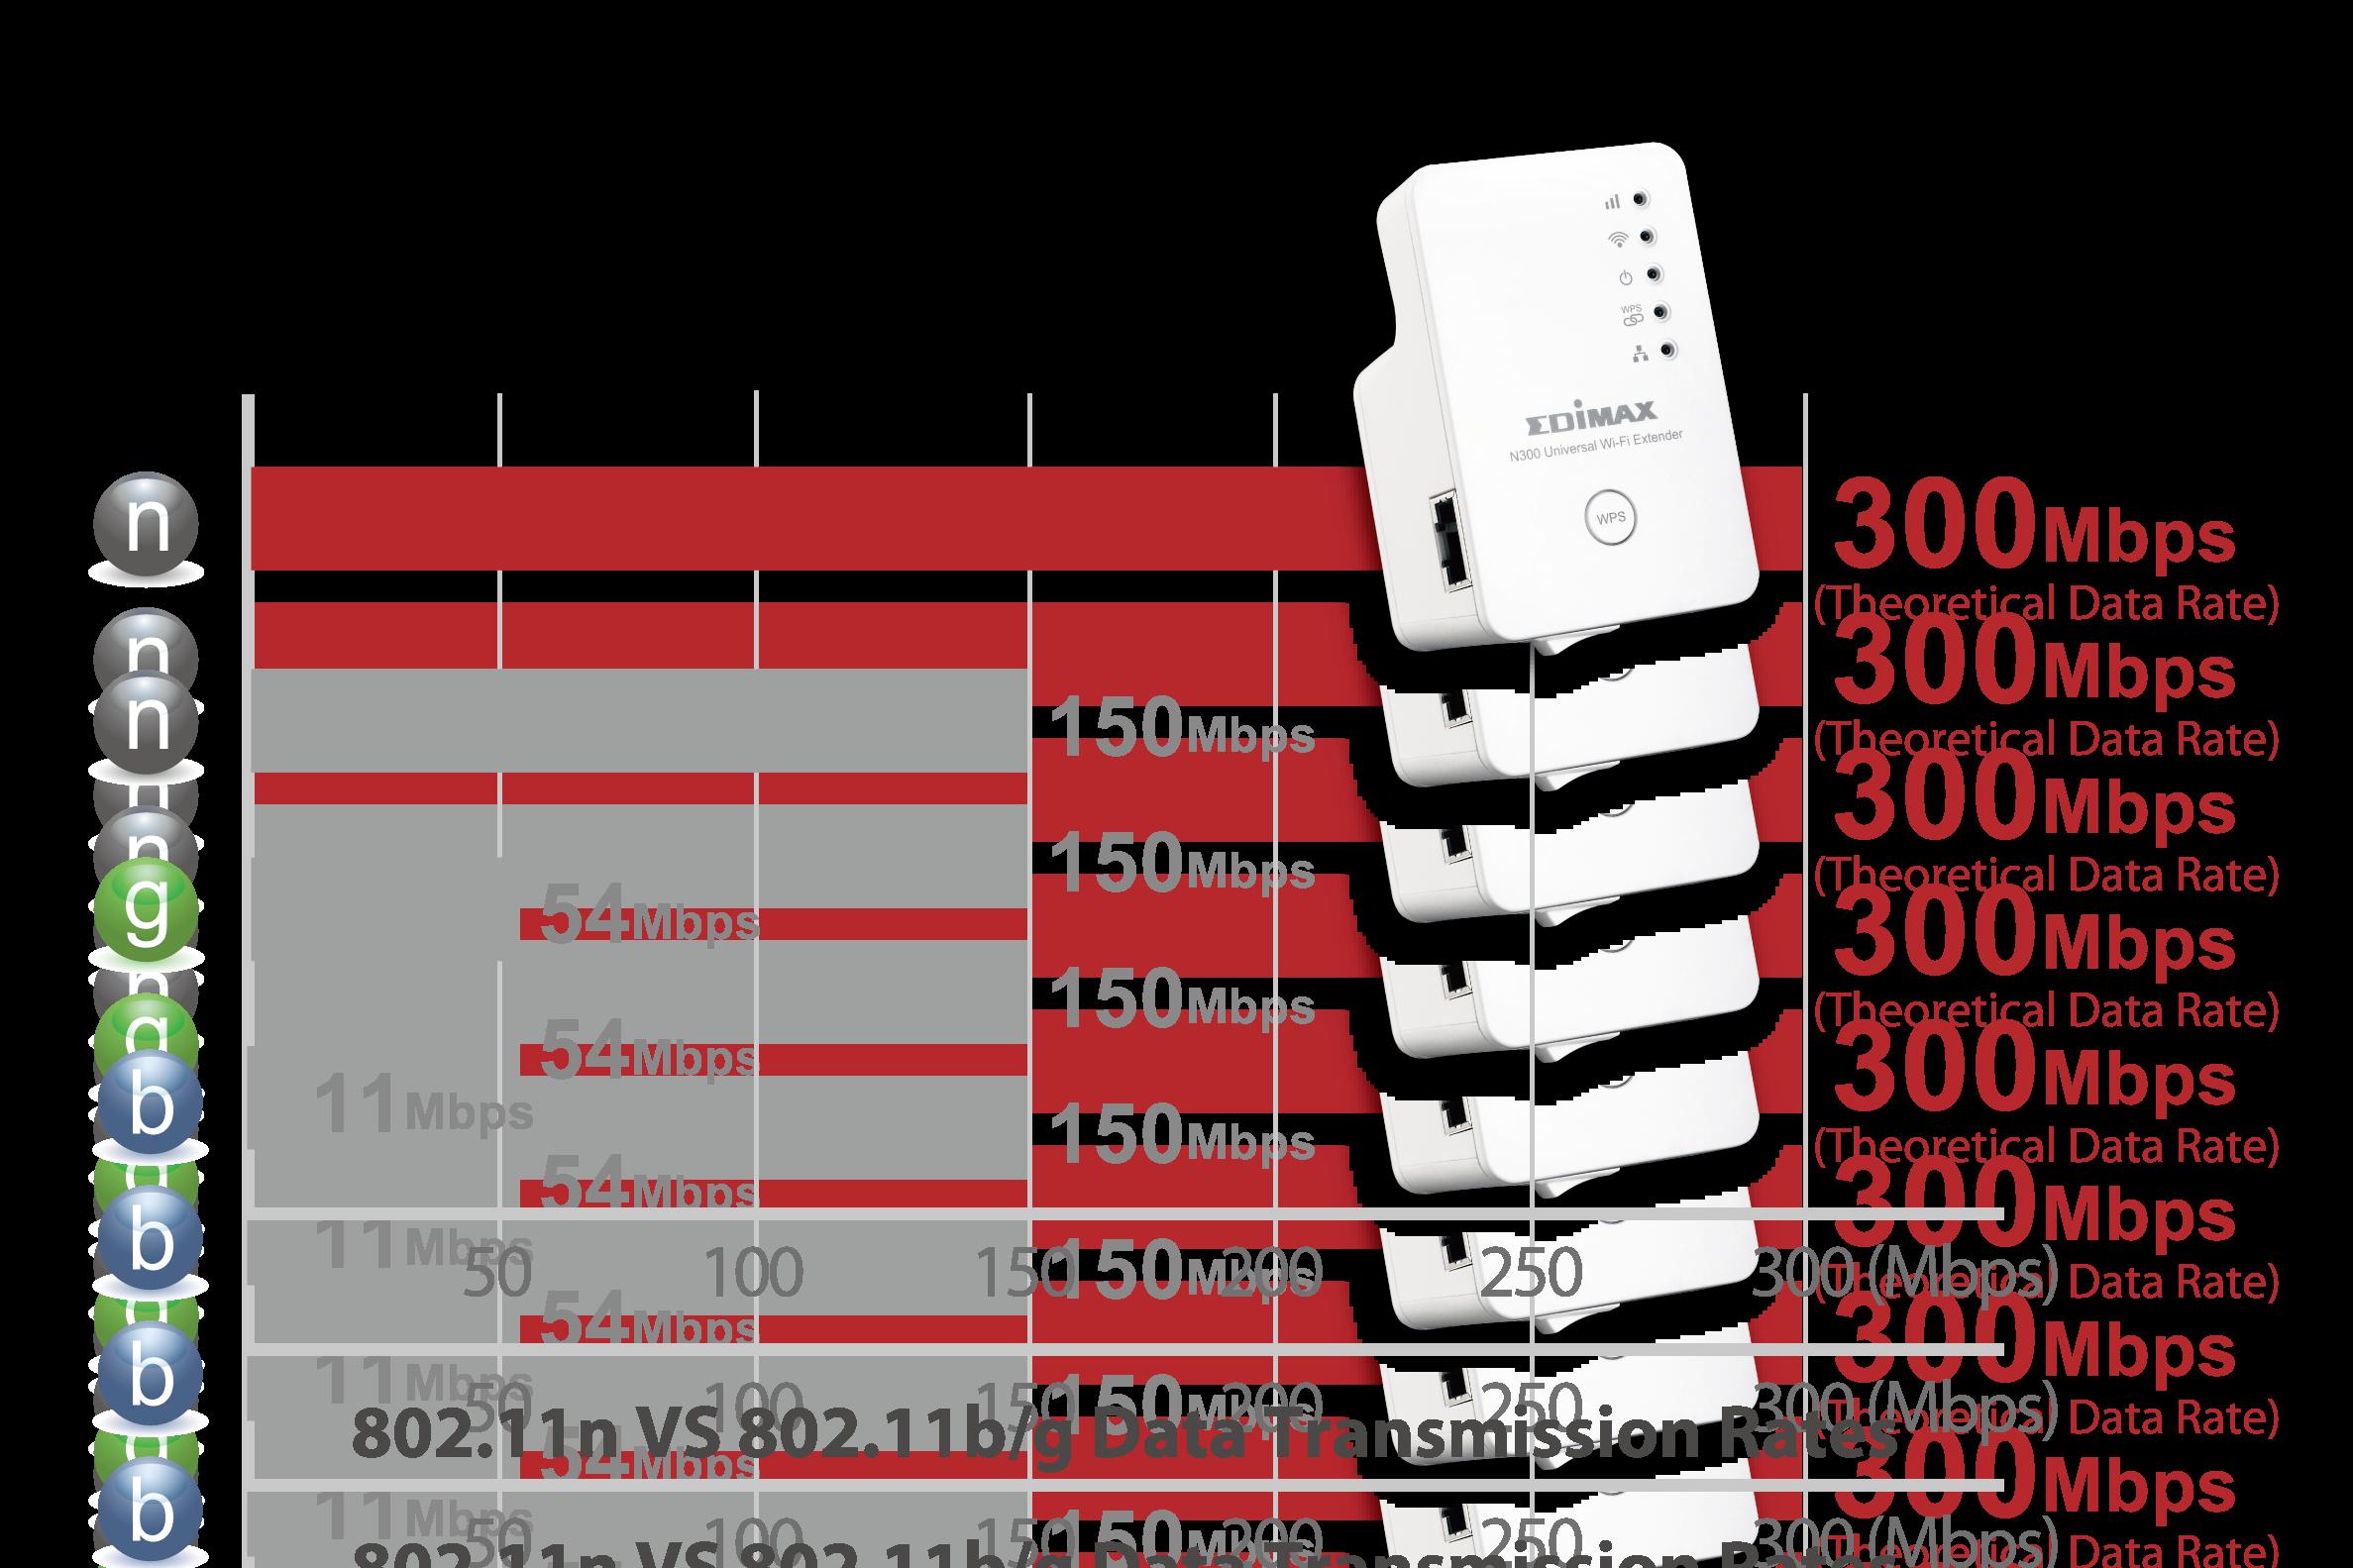 Edimax EW-7438RPn N300 Universal Smart Wi-Fi Extender/Access Point EW-7438RPn_v2_11n_g_b_300Mbps.png